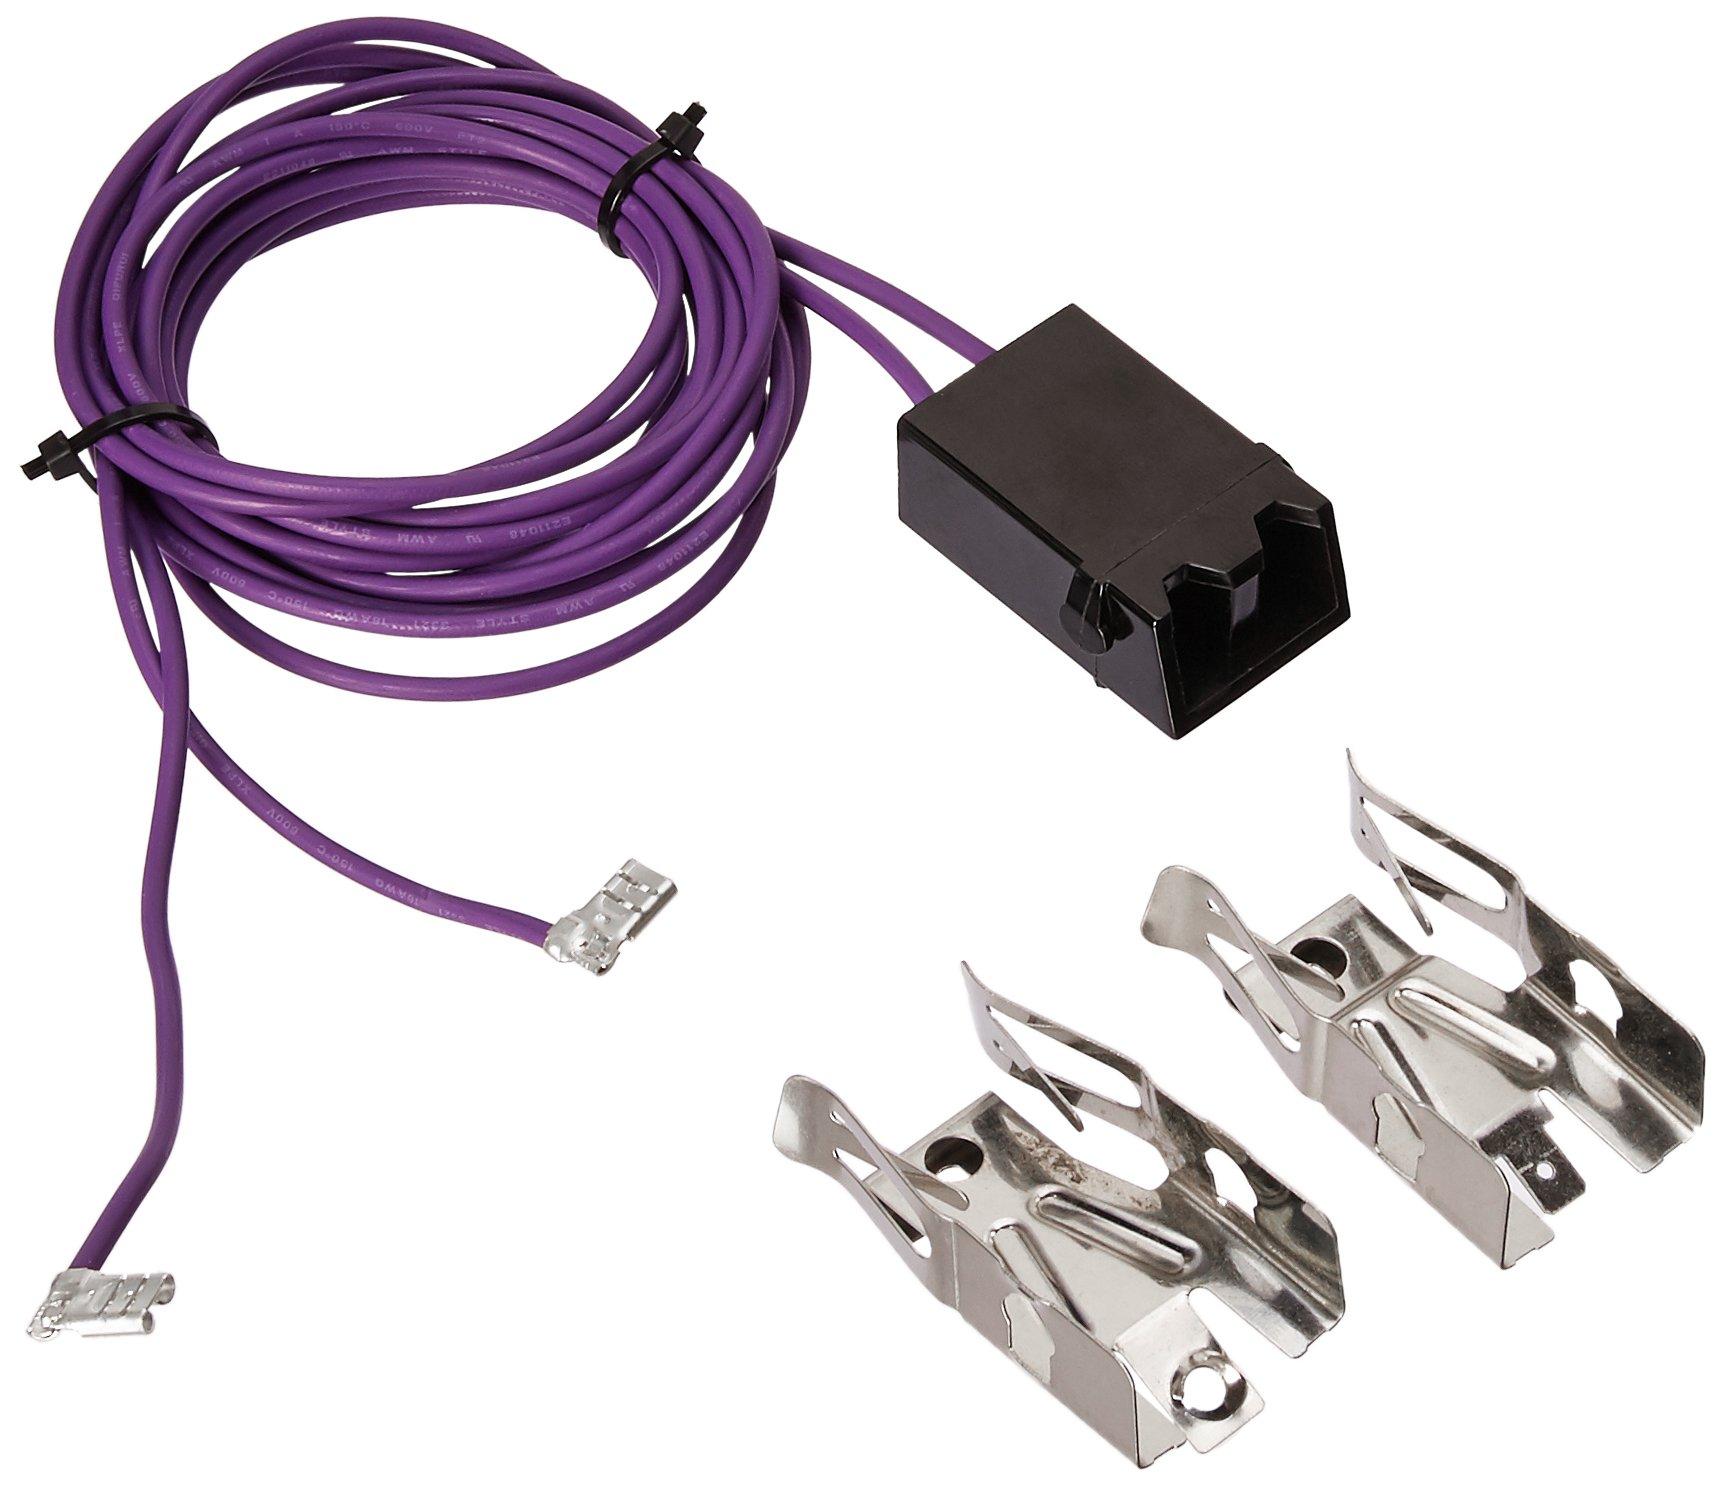 Erp Wb17t10006 Surface Element Ceramic Receptacle Block Pigtail Wire Diagram For Stove Appliances